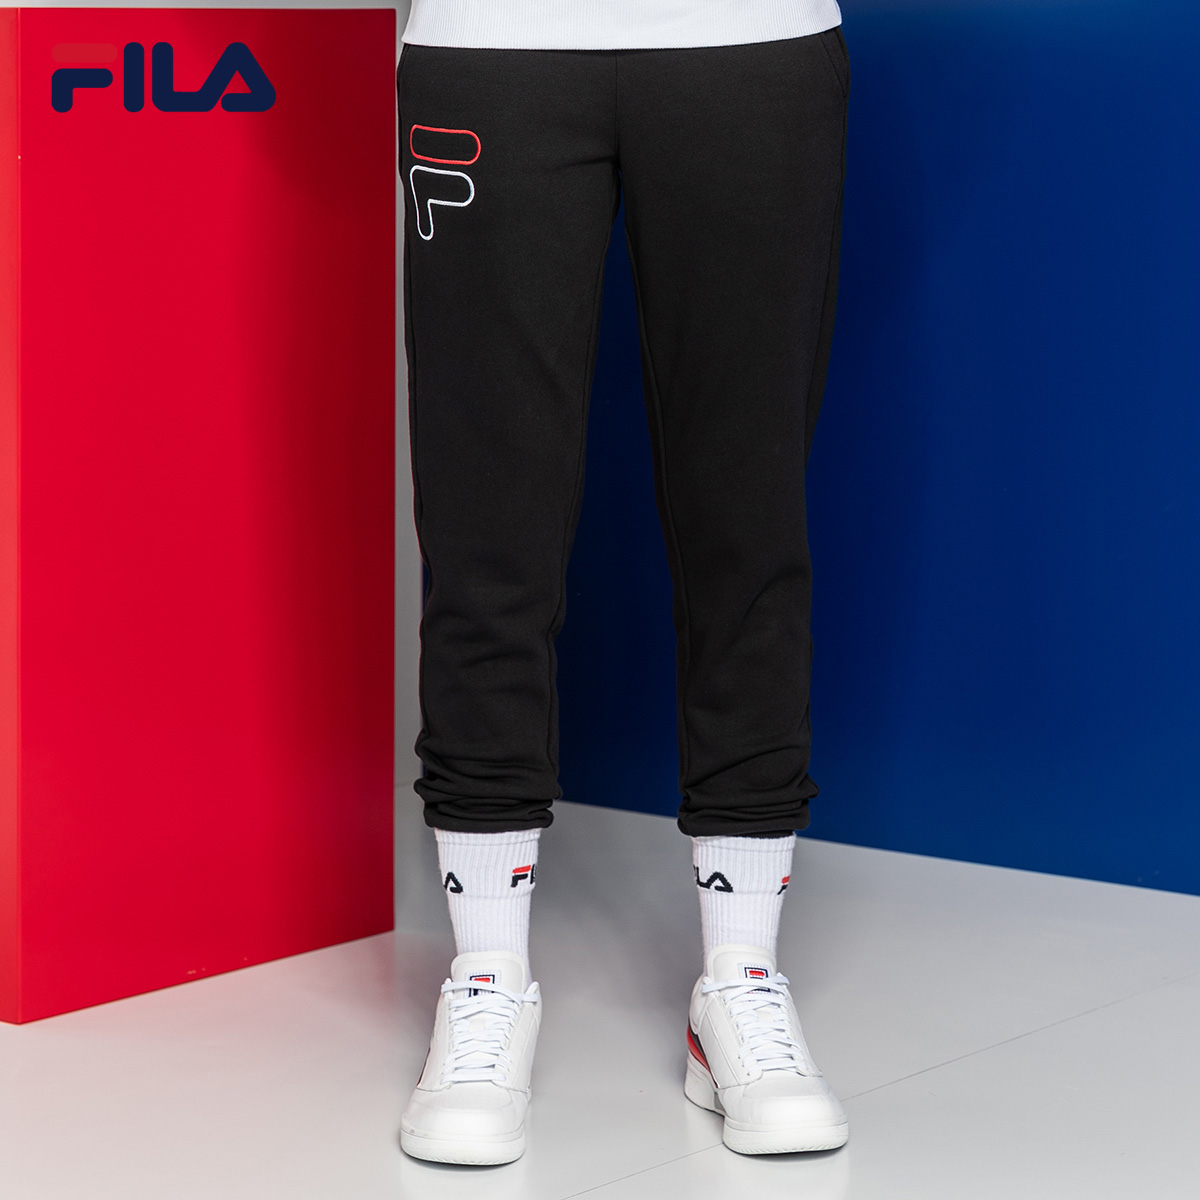 FILA斐乐运动裤长裤女2018冬季新品时尚透气休闲裤女潮流舒适长裤